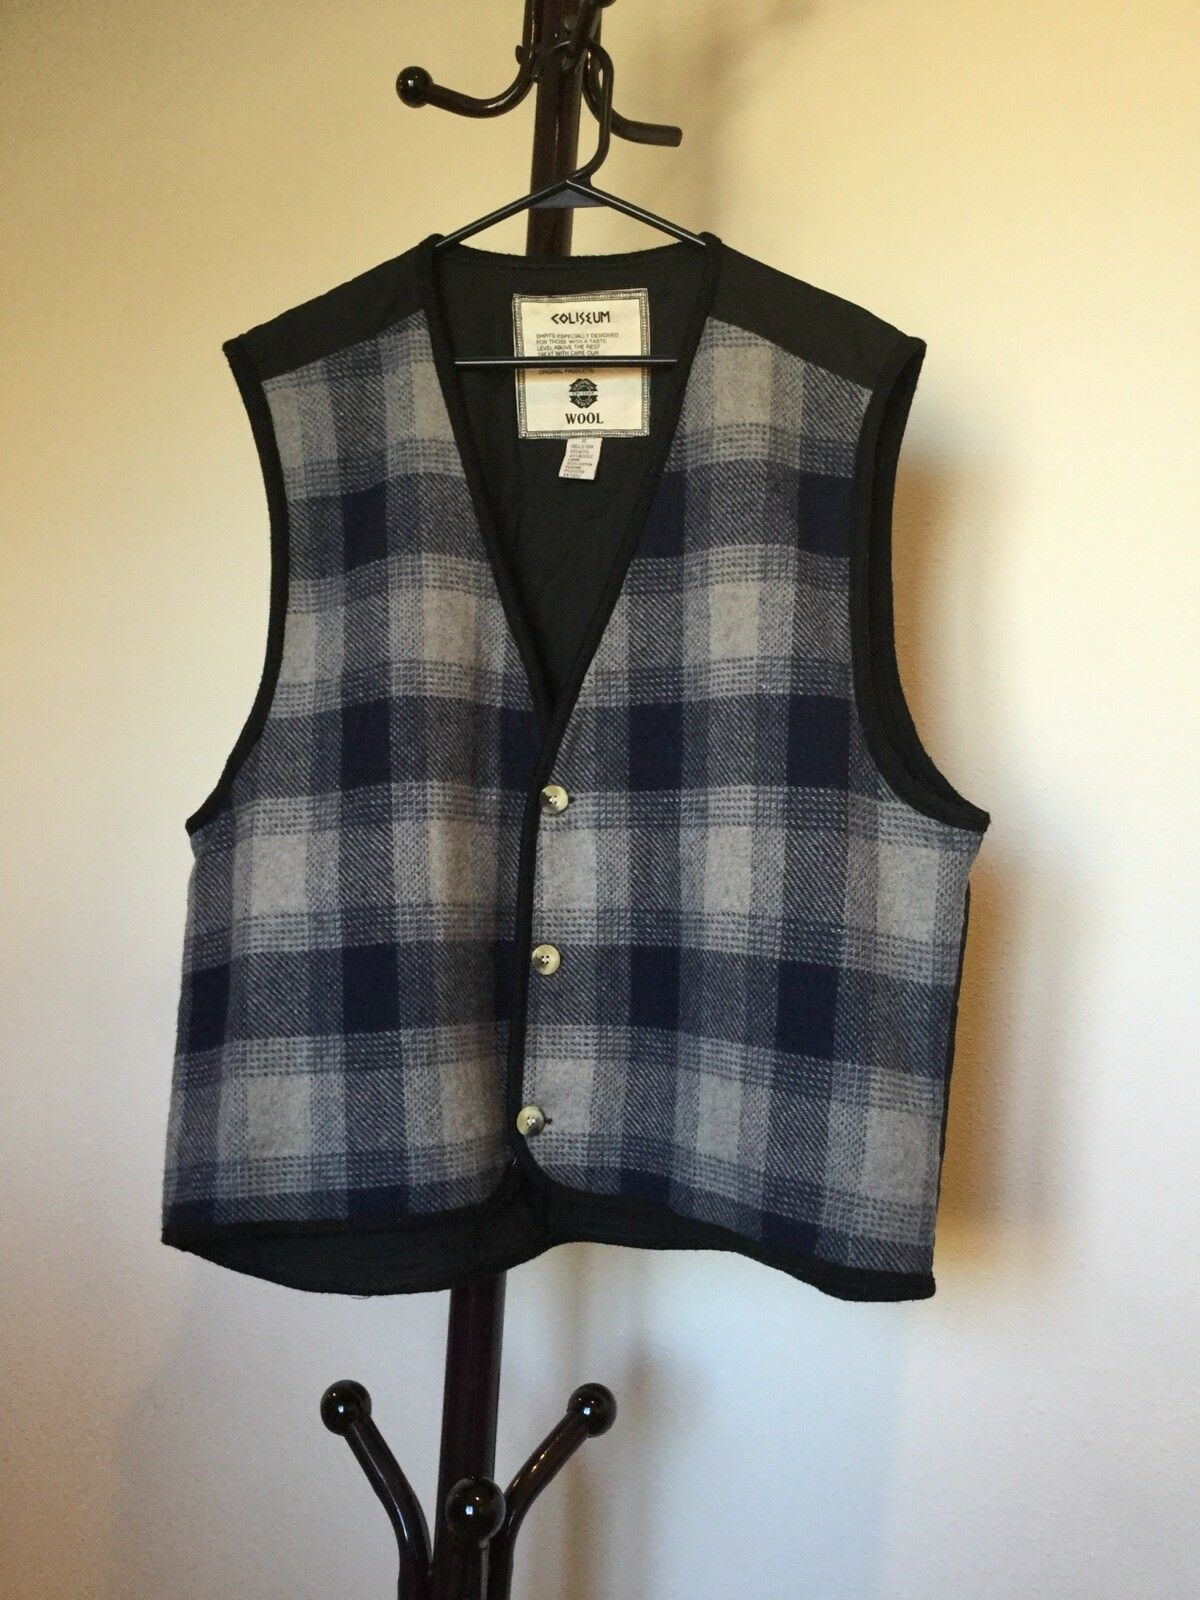 Women's COLISSUM WOOL Button Up Navy bluee Plaid Wool Blend Vest Size XL